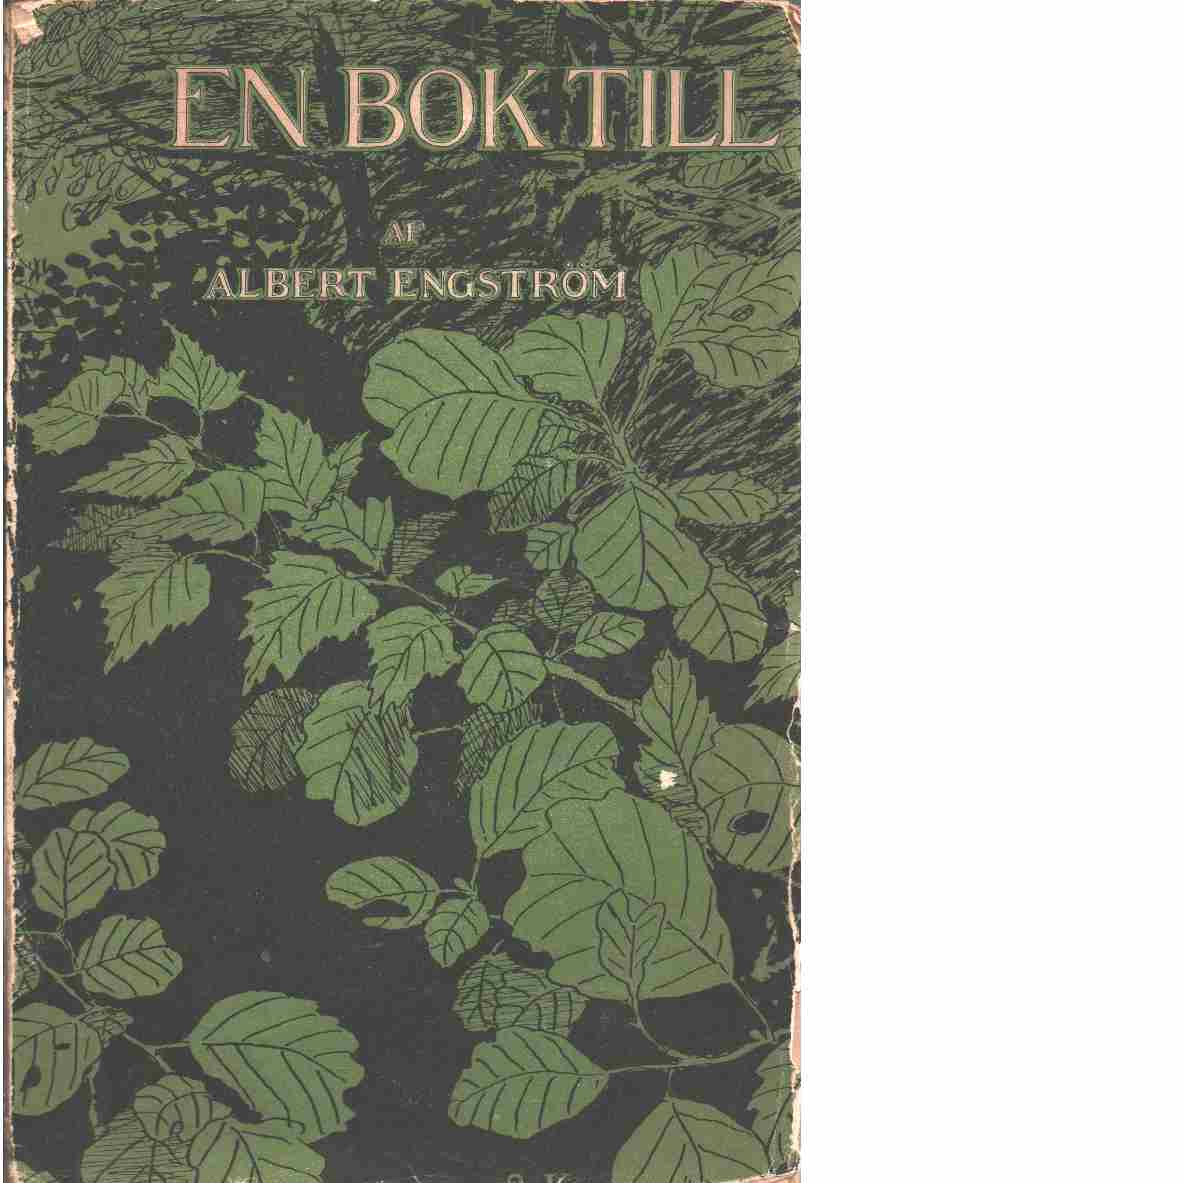 En bok till  - Engström, Albert